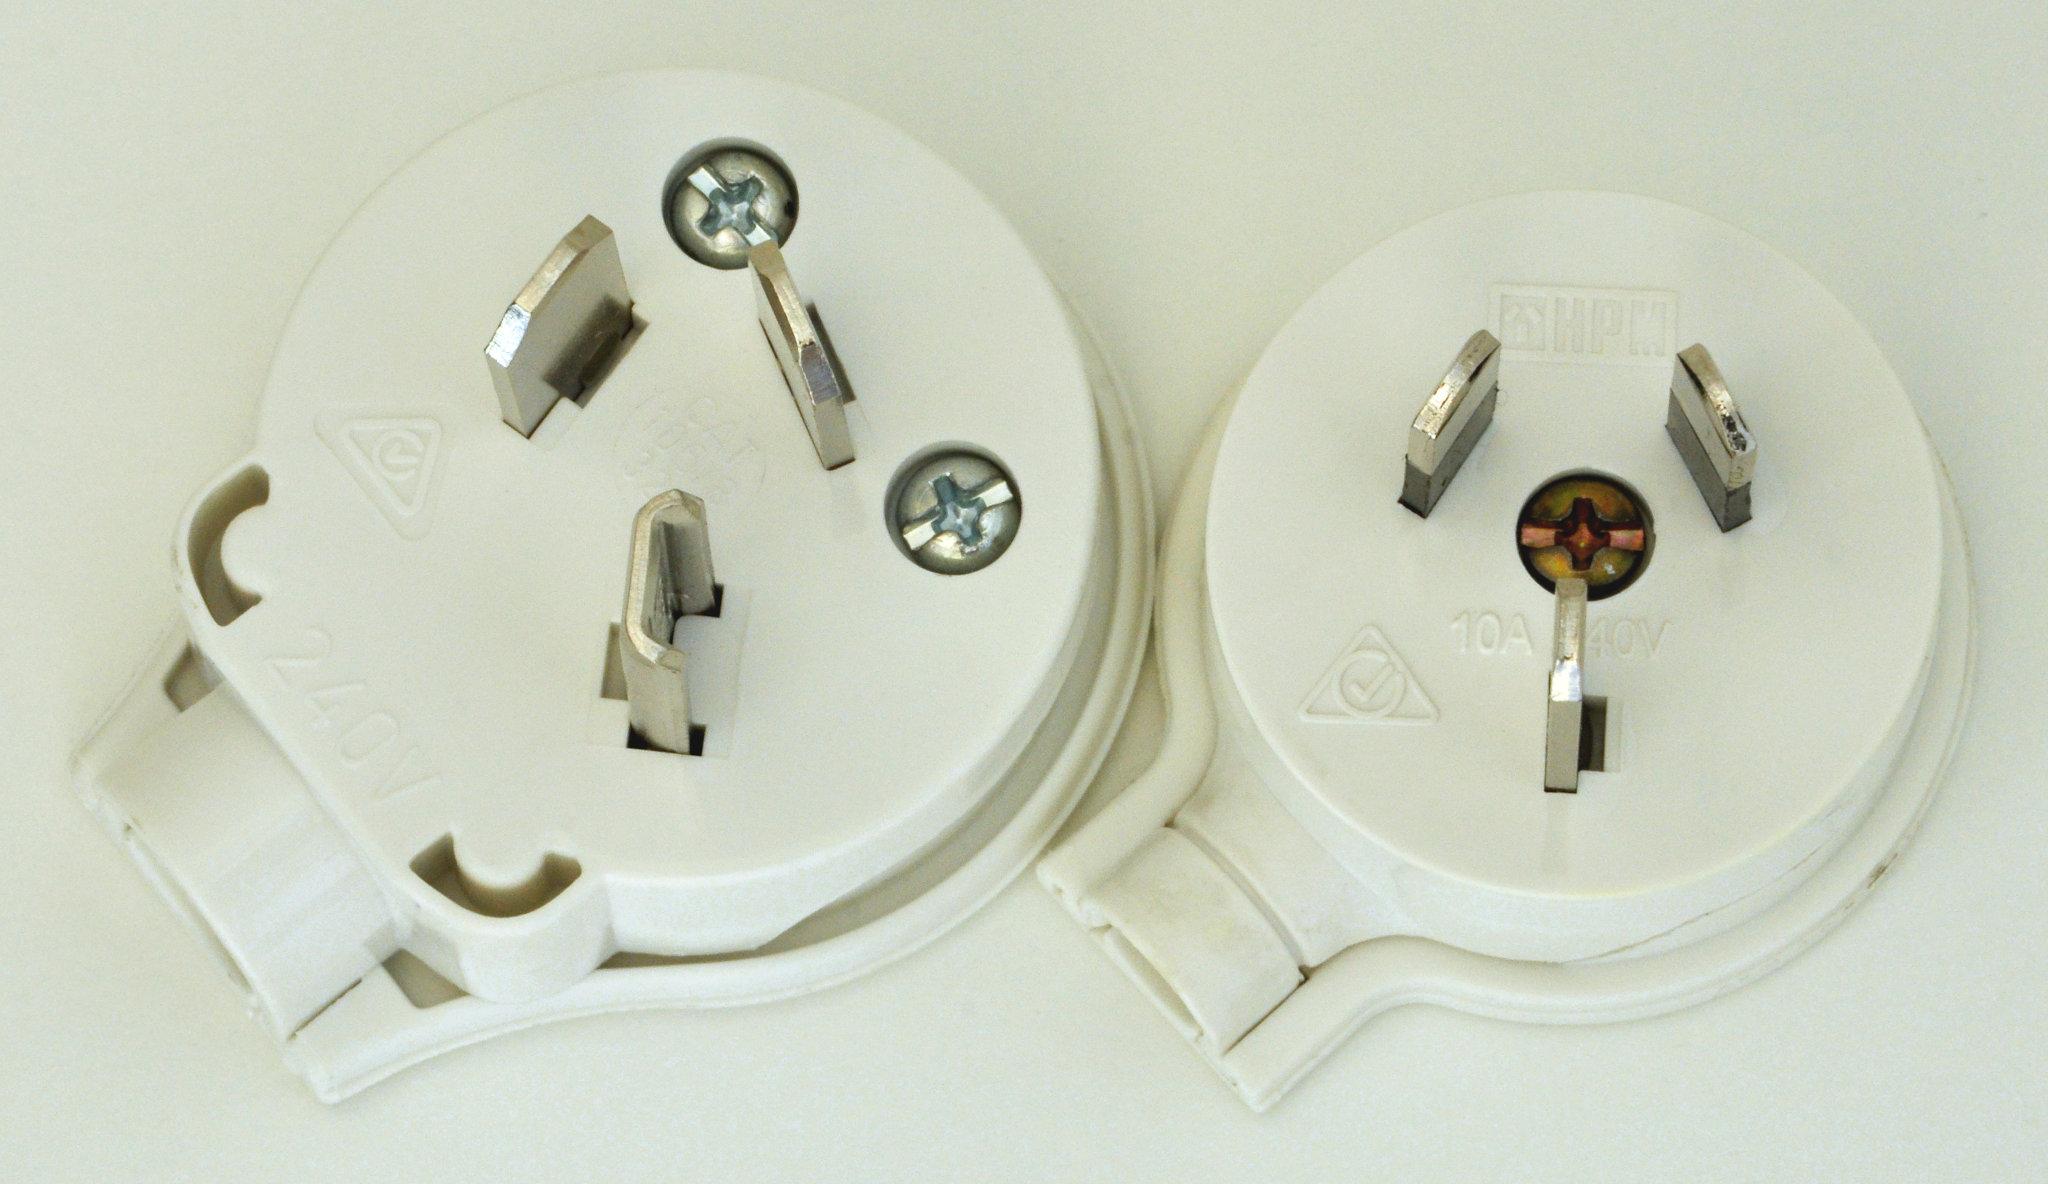 3 Pin AU Power Flat Male Plug Rewireable Electrical Industrial 240 Volt 10AMP